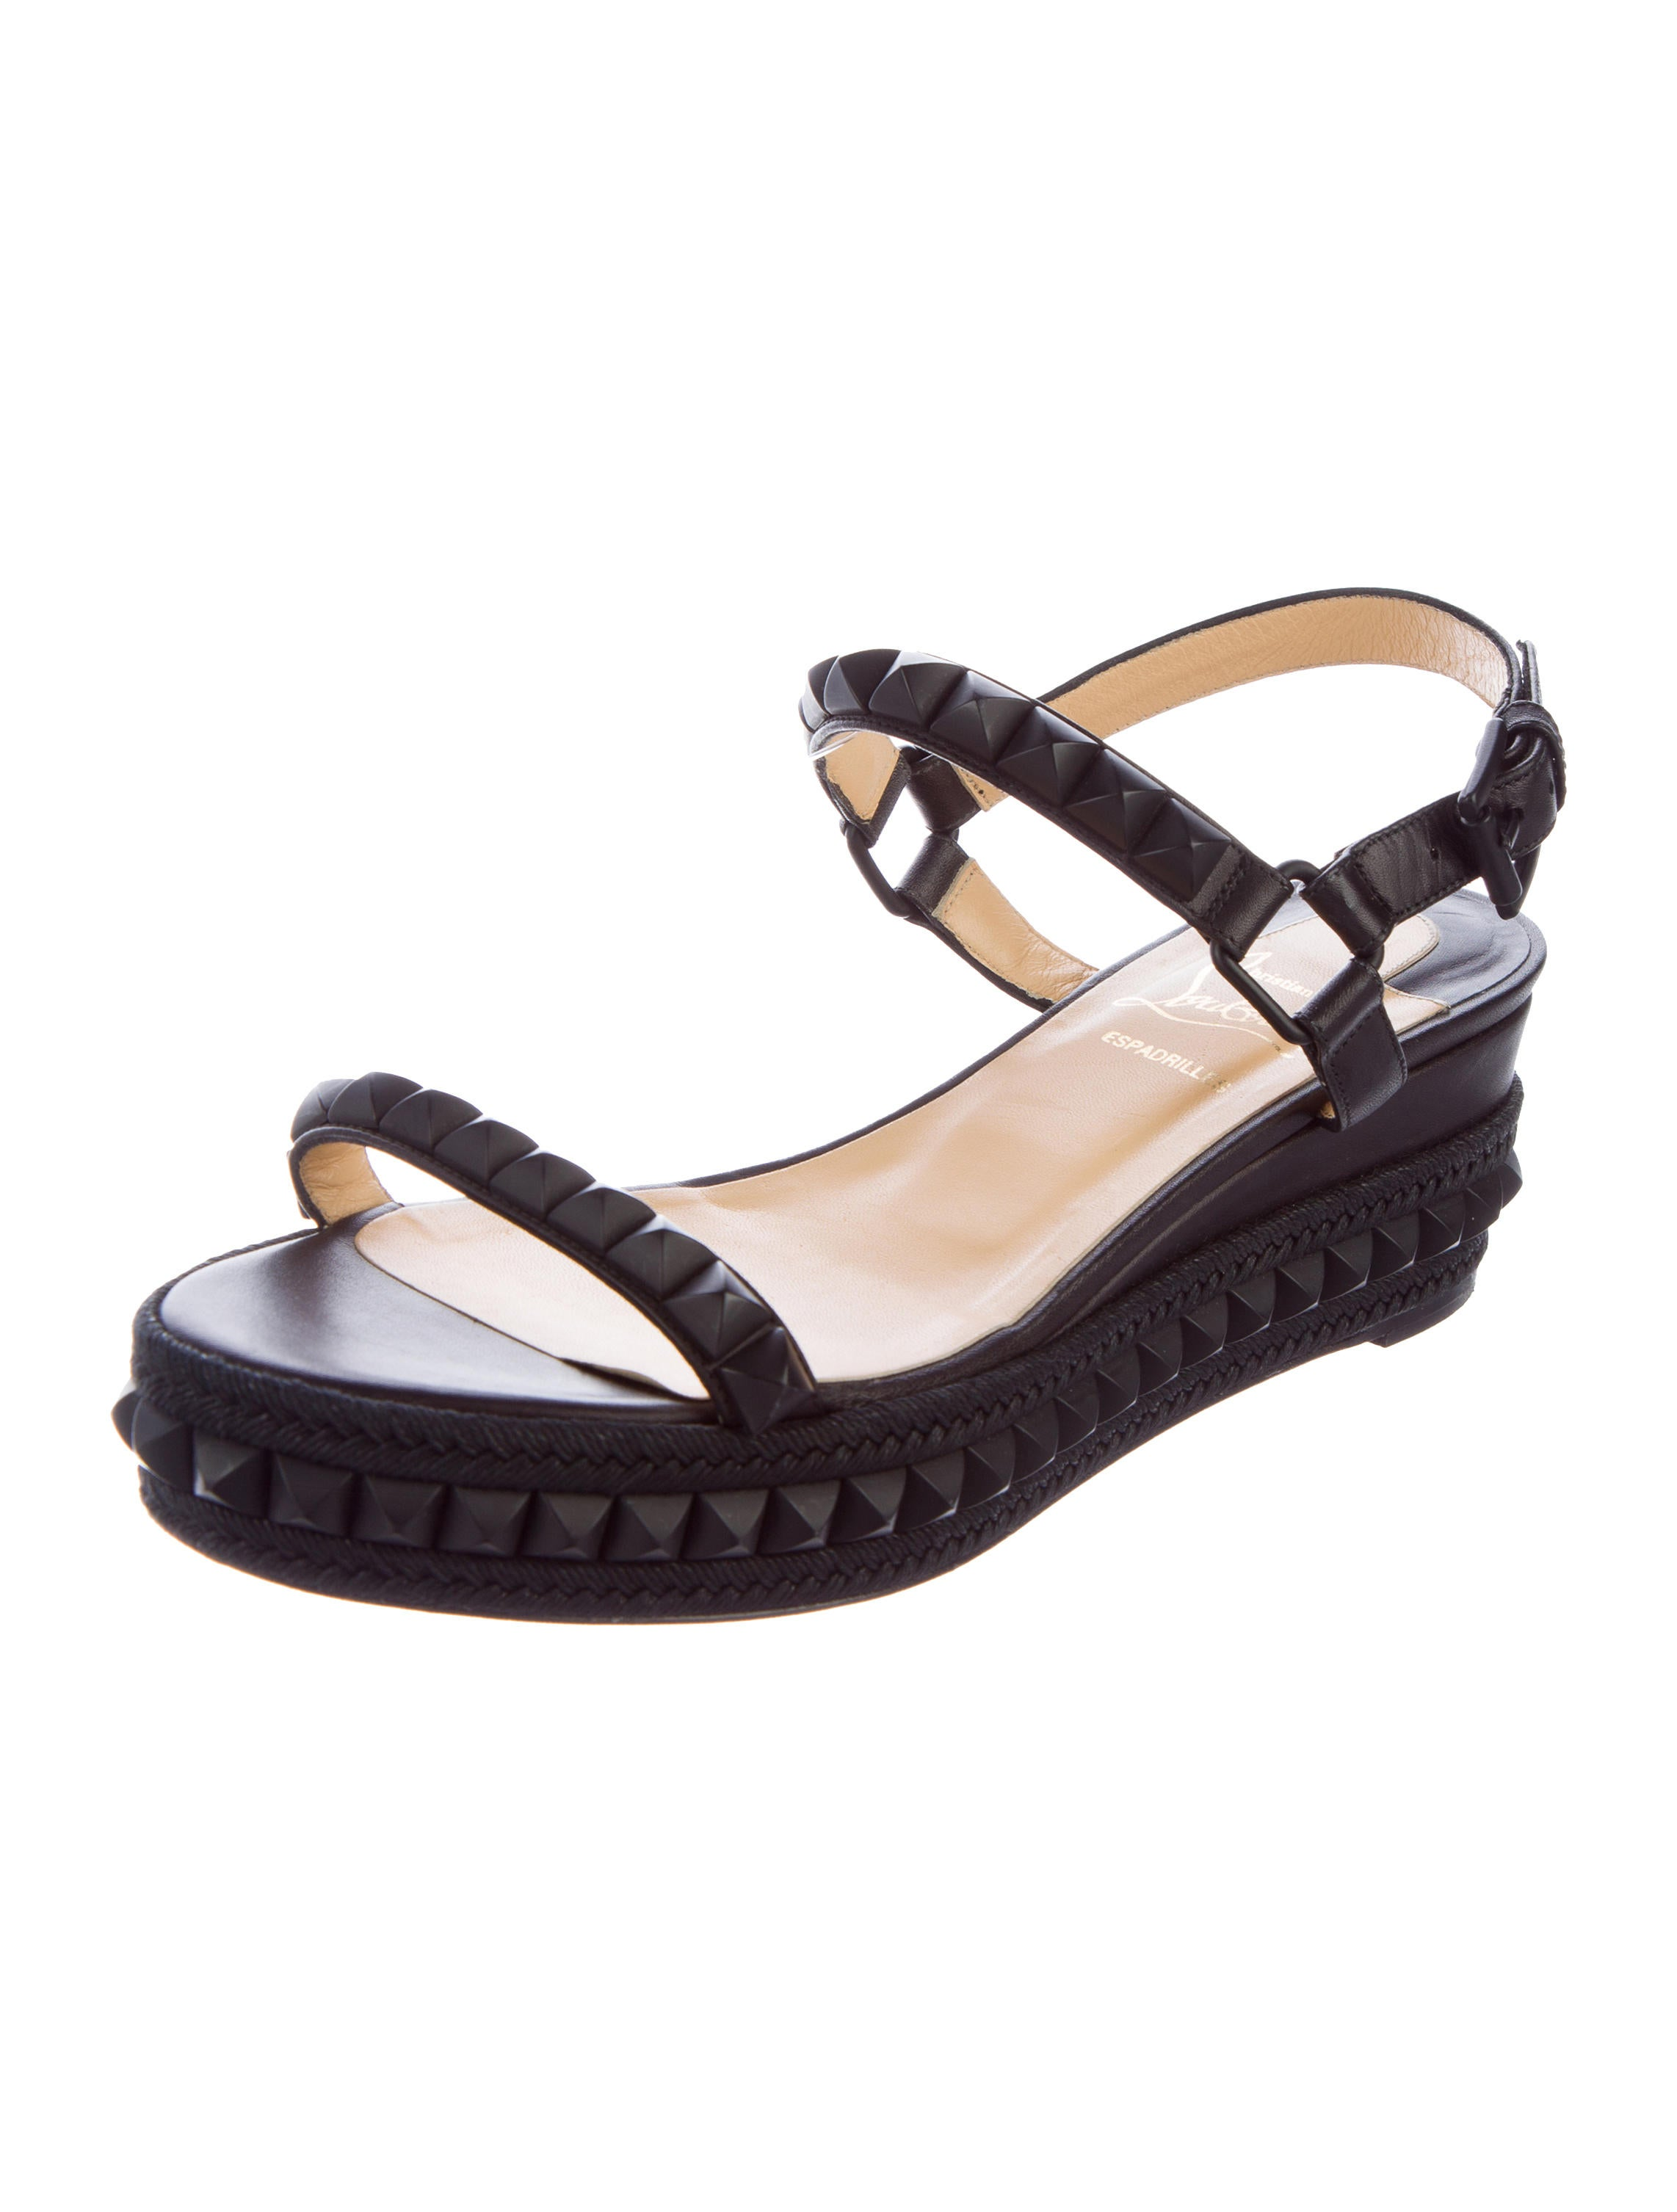 christian louboutin spiked platform sandals shoes